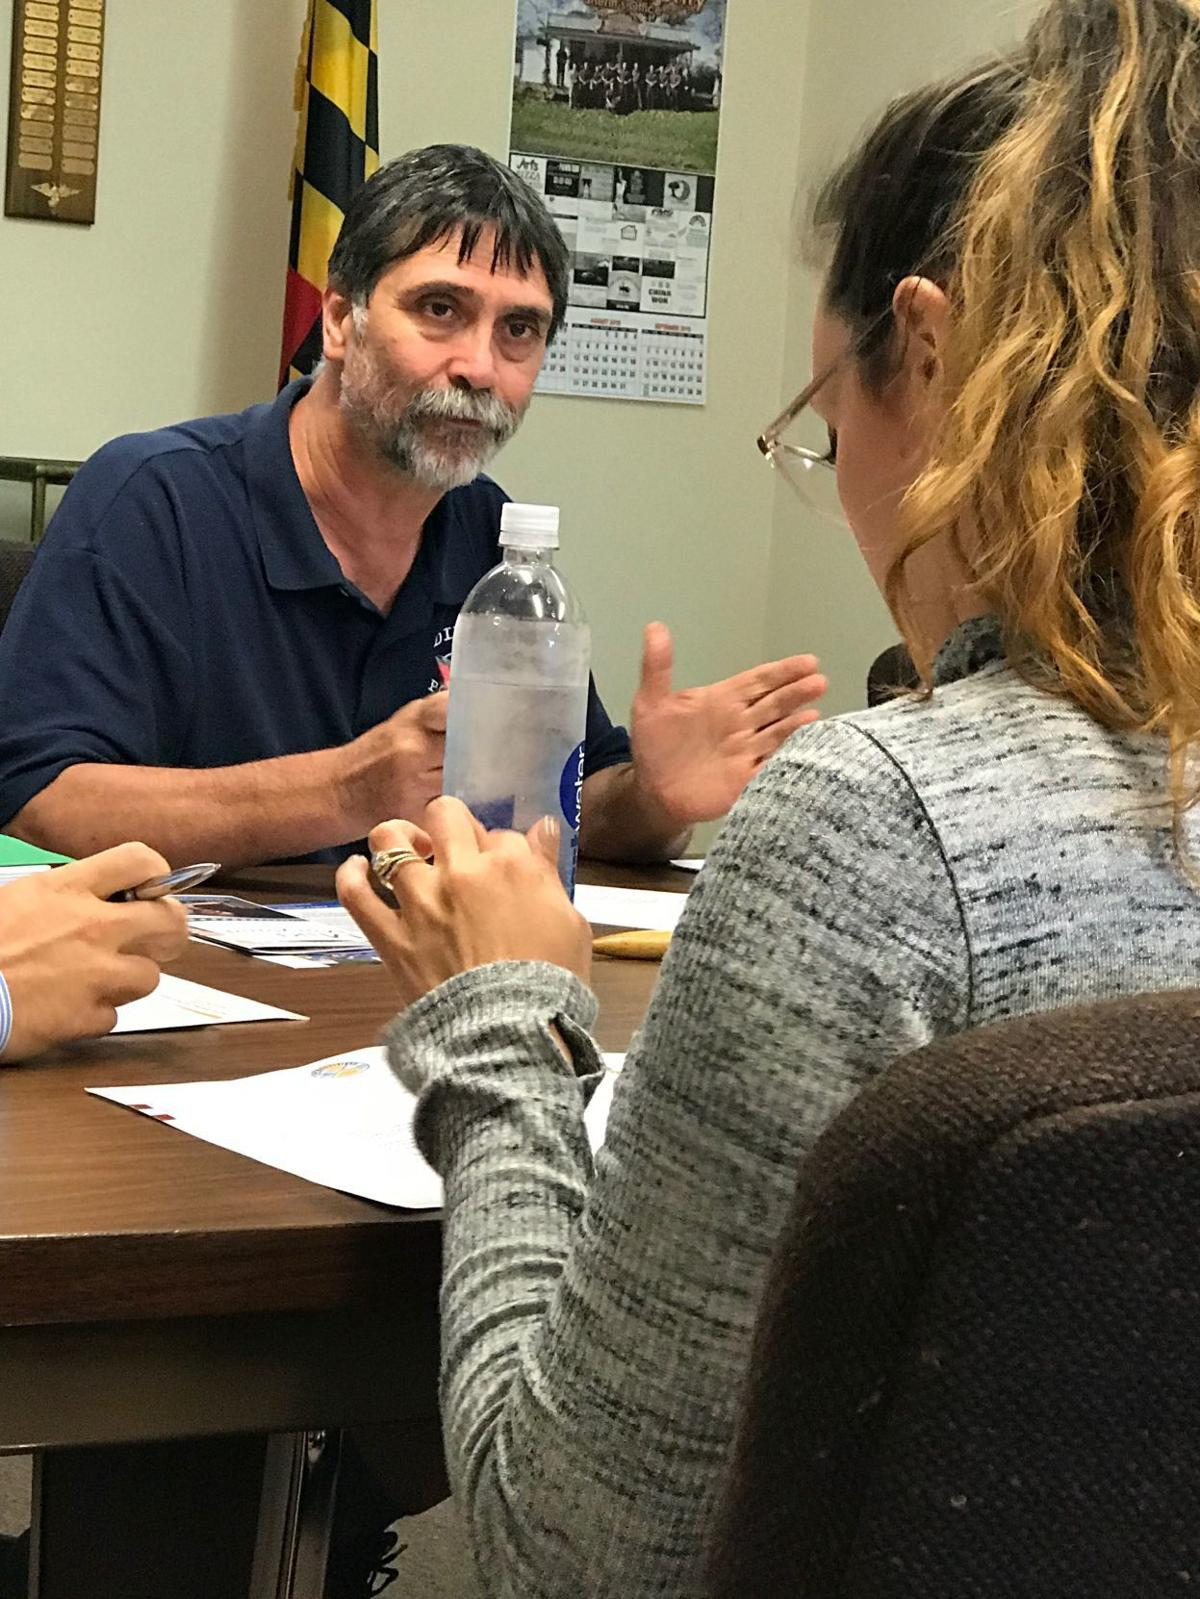 Progress made toward security cameras in Grantsville